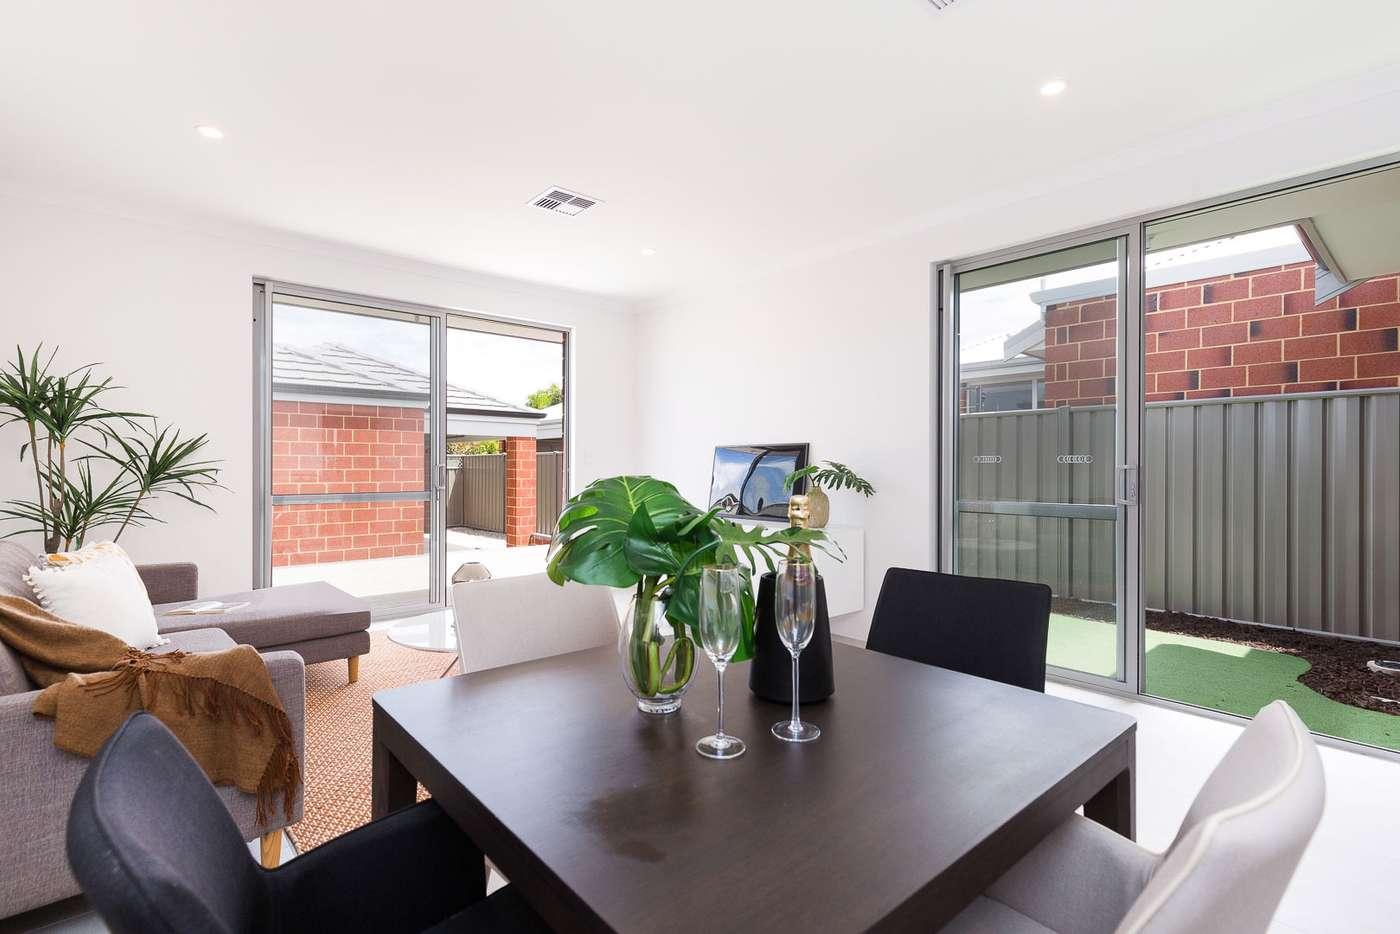 Sixth view of Homely house listing, 365 Lambeth Circle, Wellard WA 6170